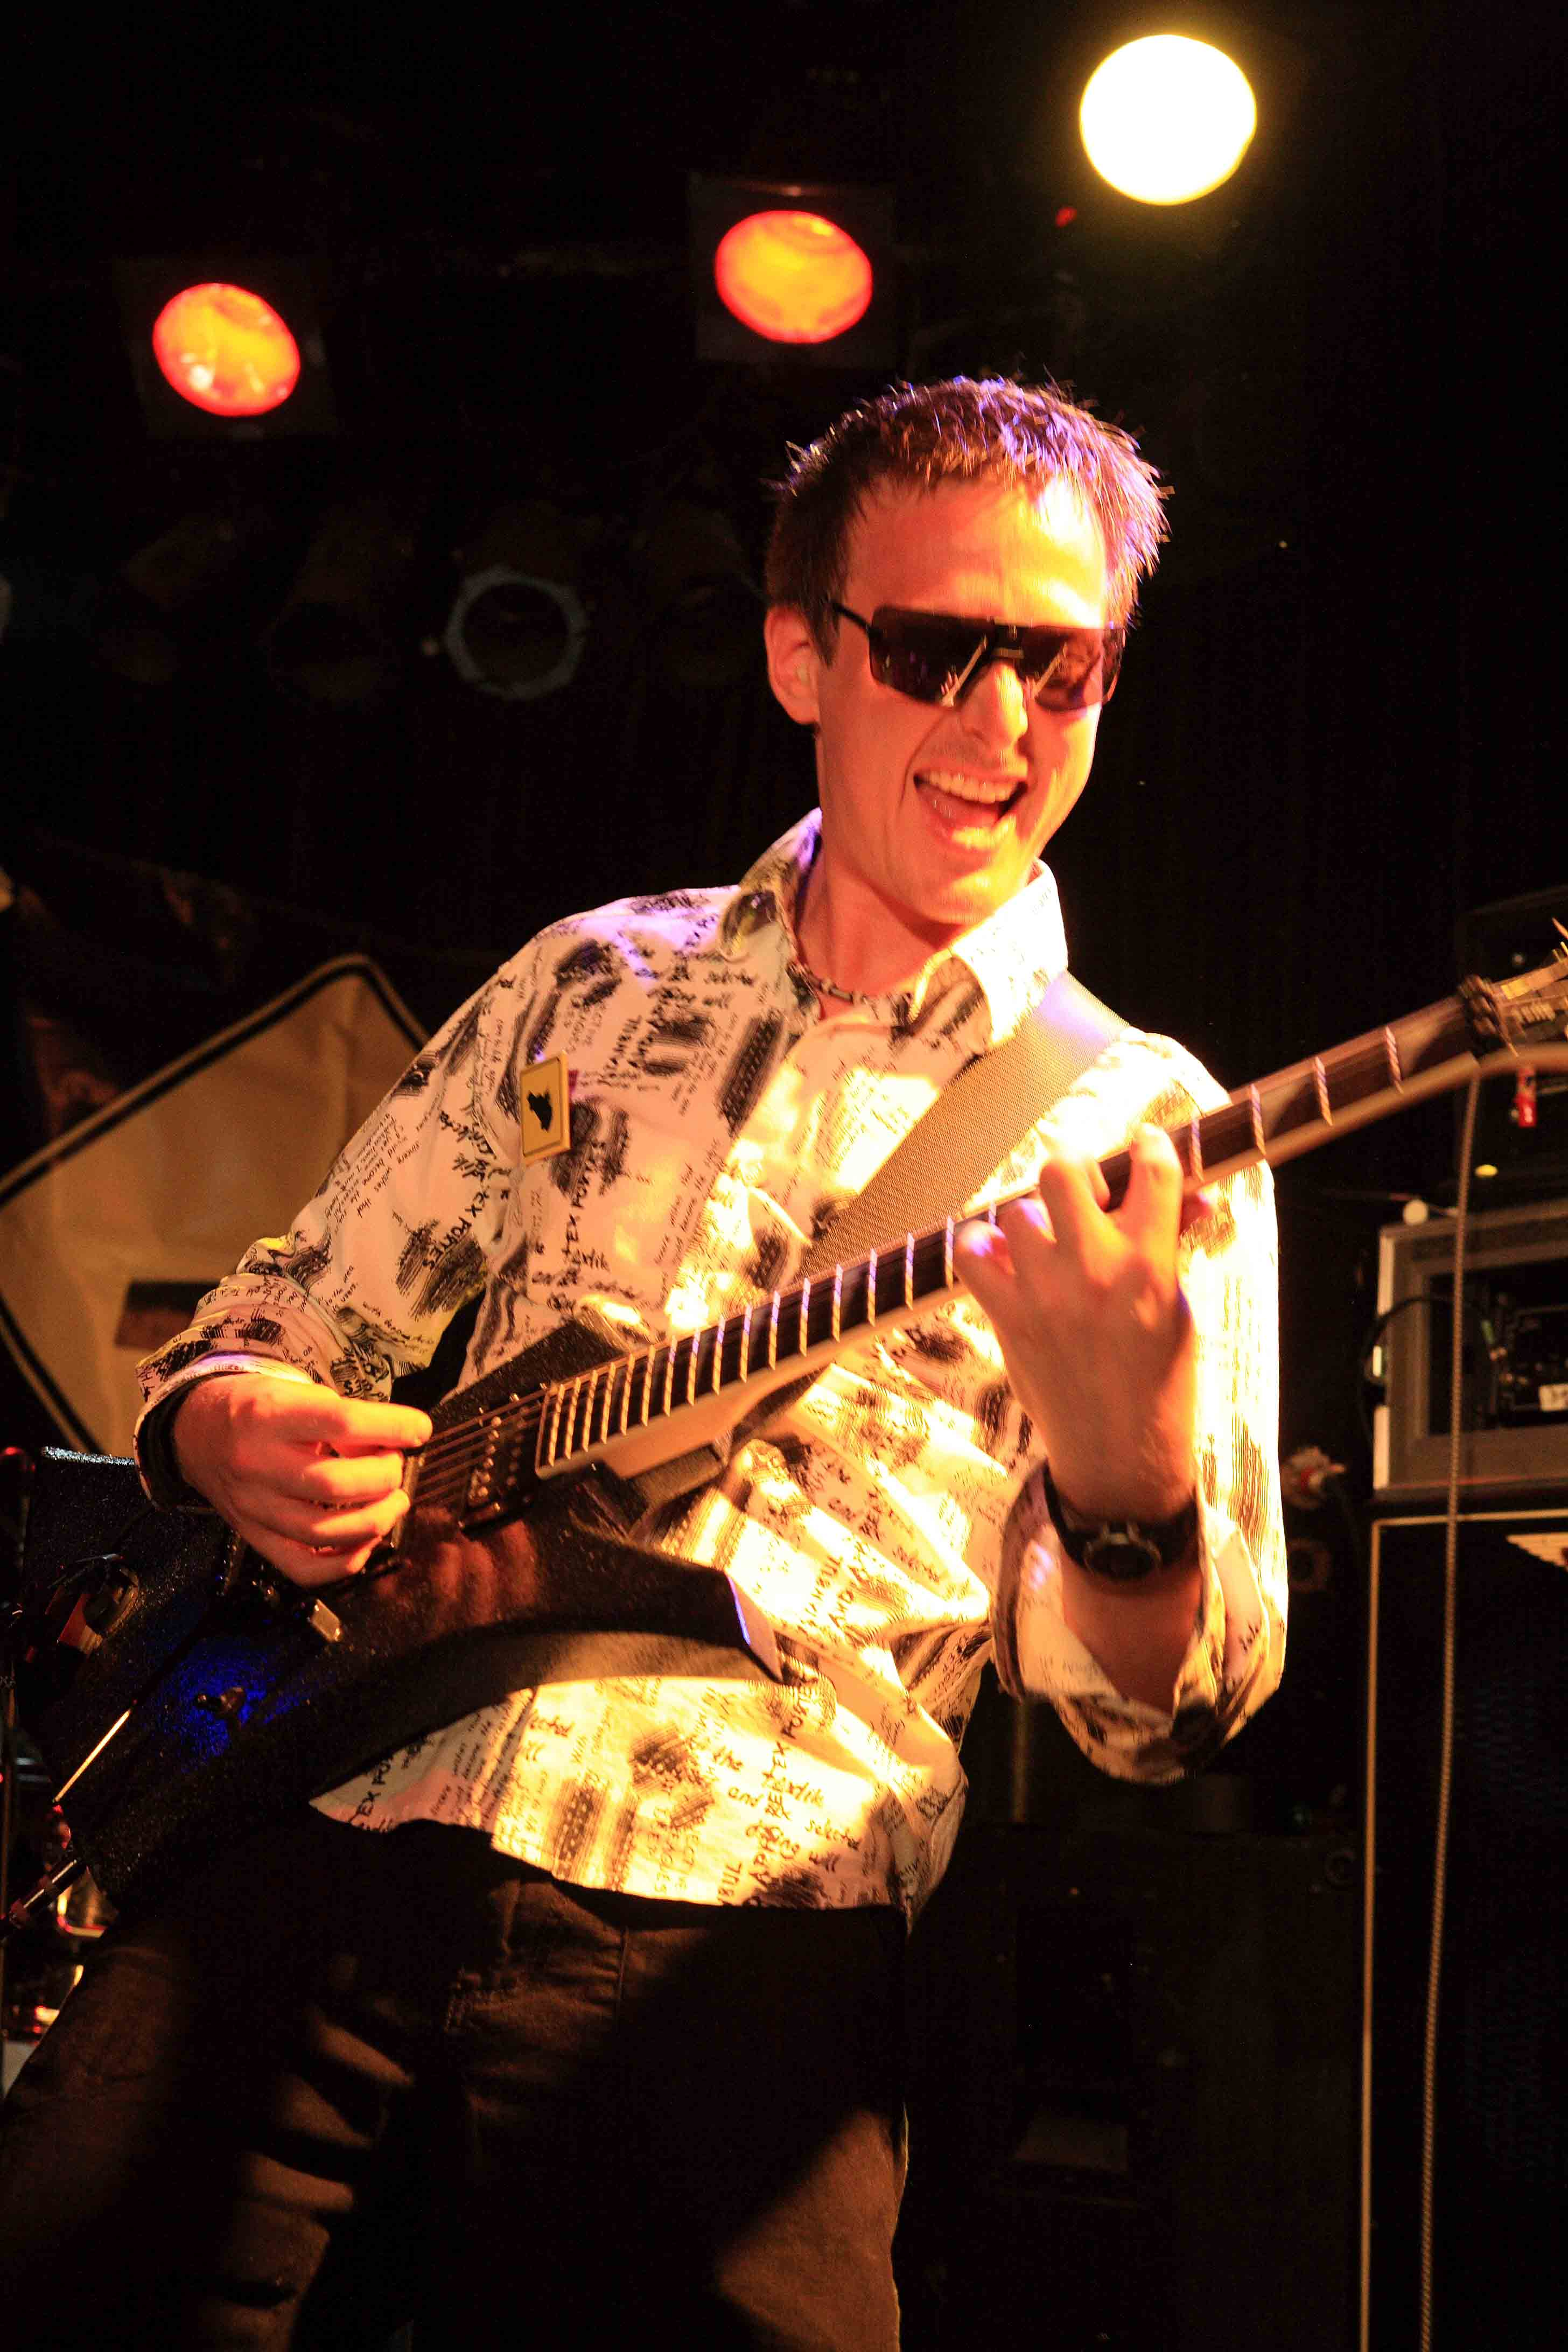 Corey Birkholz 7-28-07 Viper Room Hollywood, CA (First Show